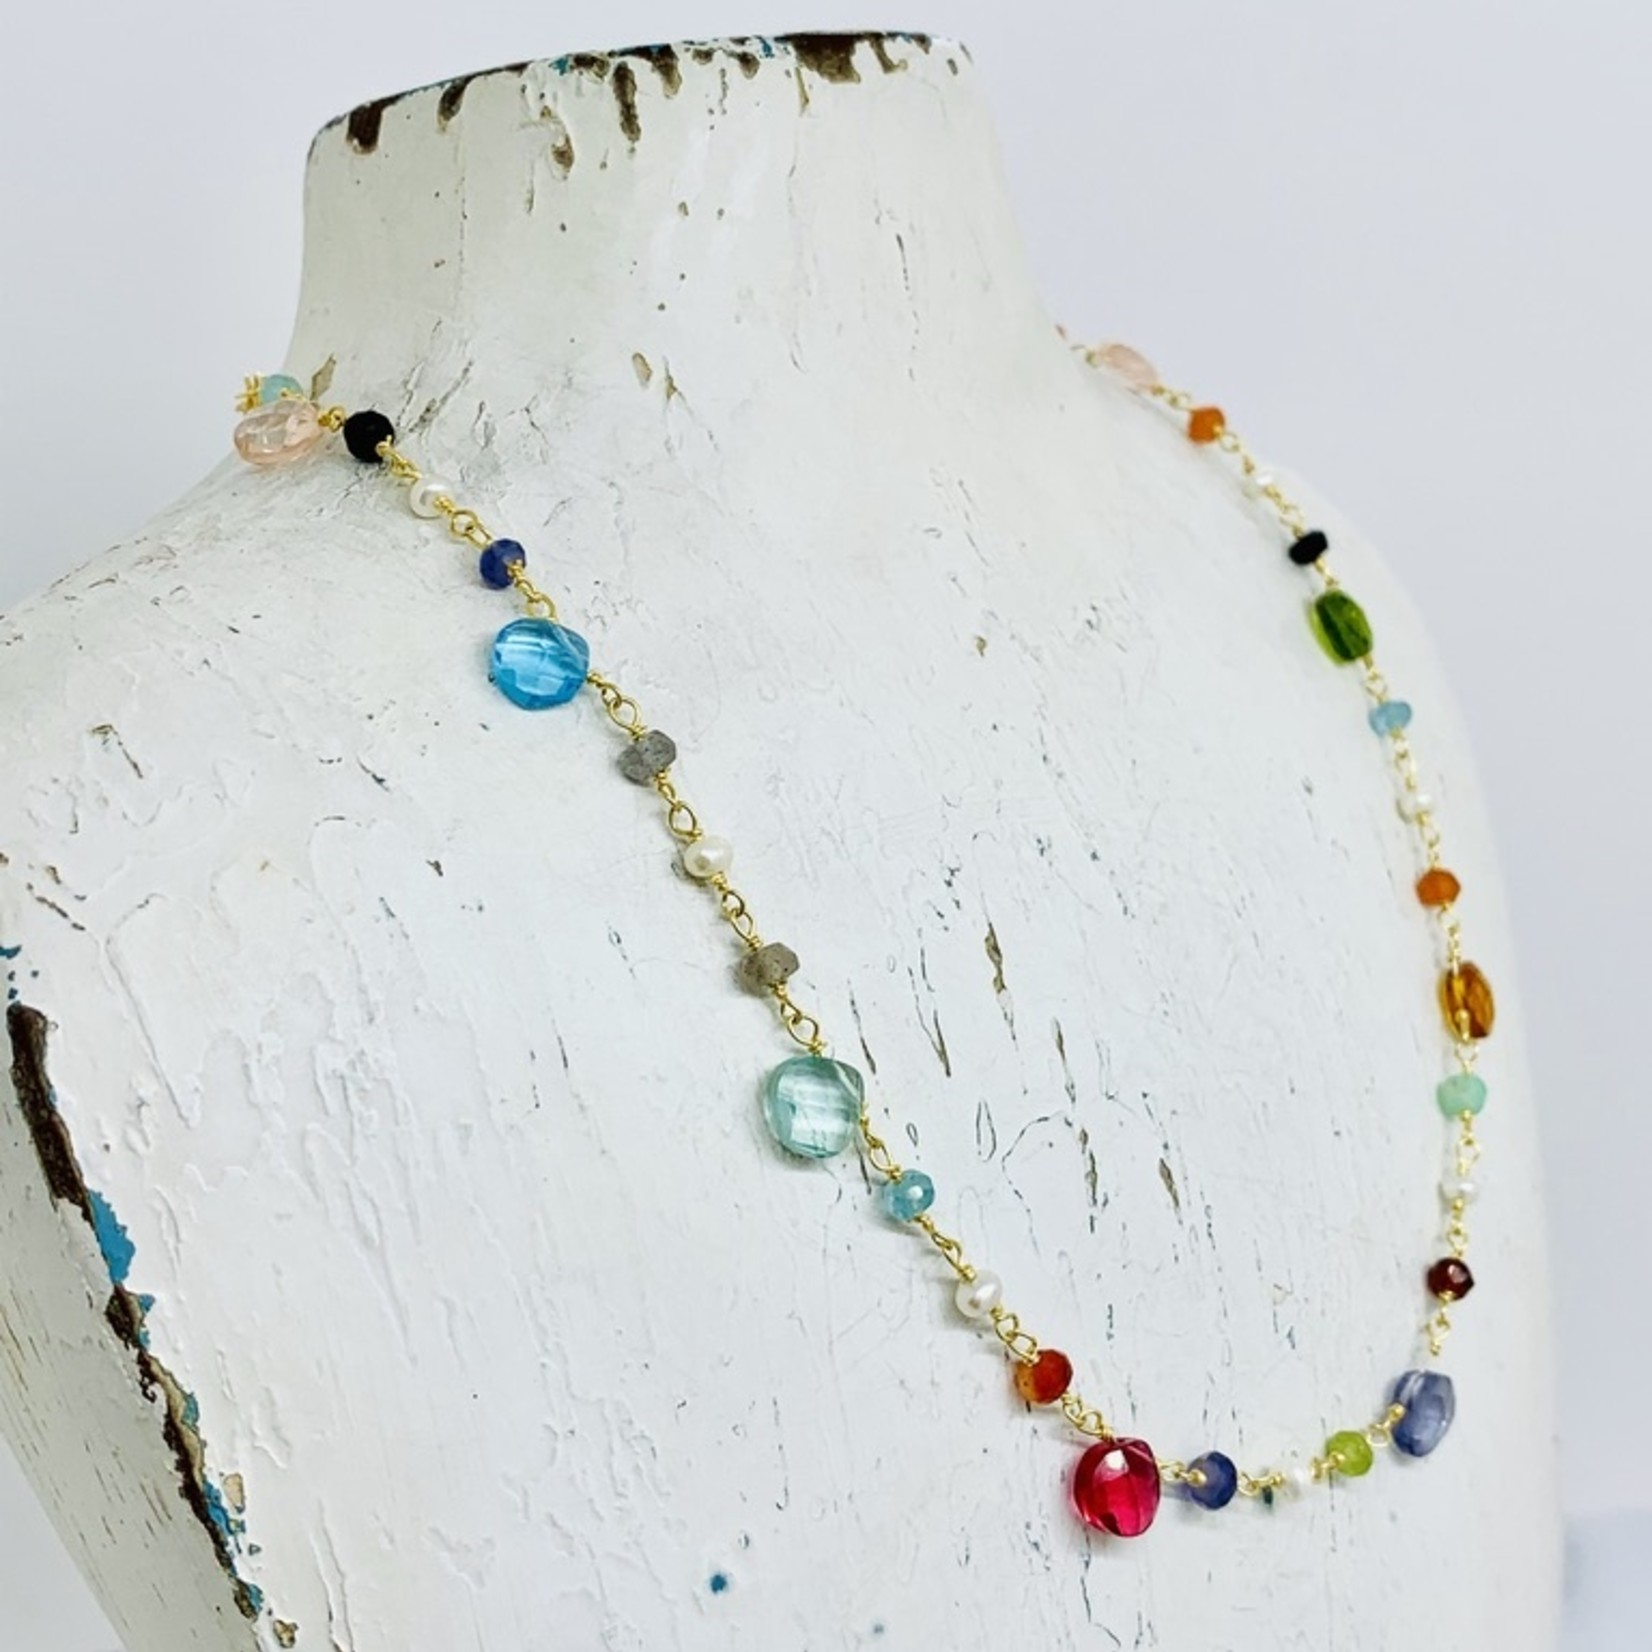 "Native Gems GUM DROP necklace, 14-16"" with rose quartz, aquamarine, pearl, labradorite onyx and 14K gold vermeil"